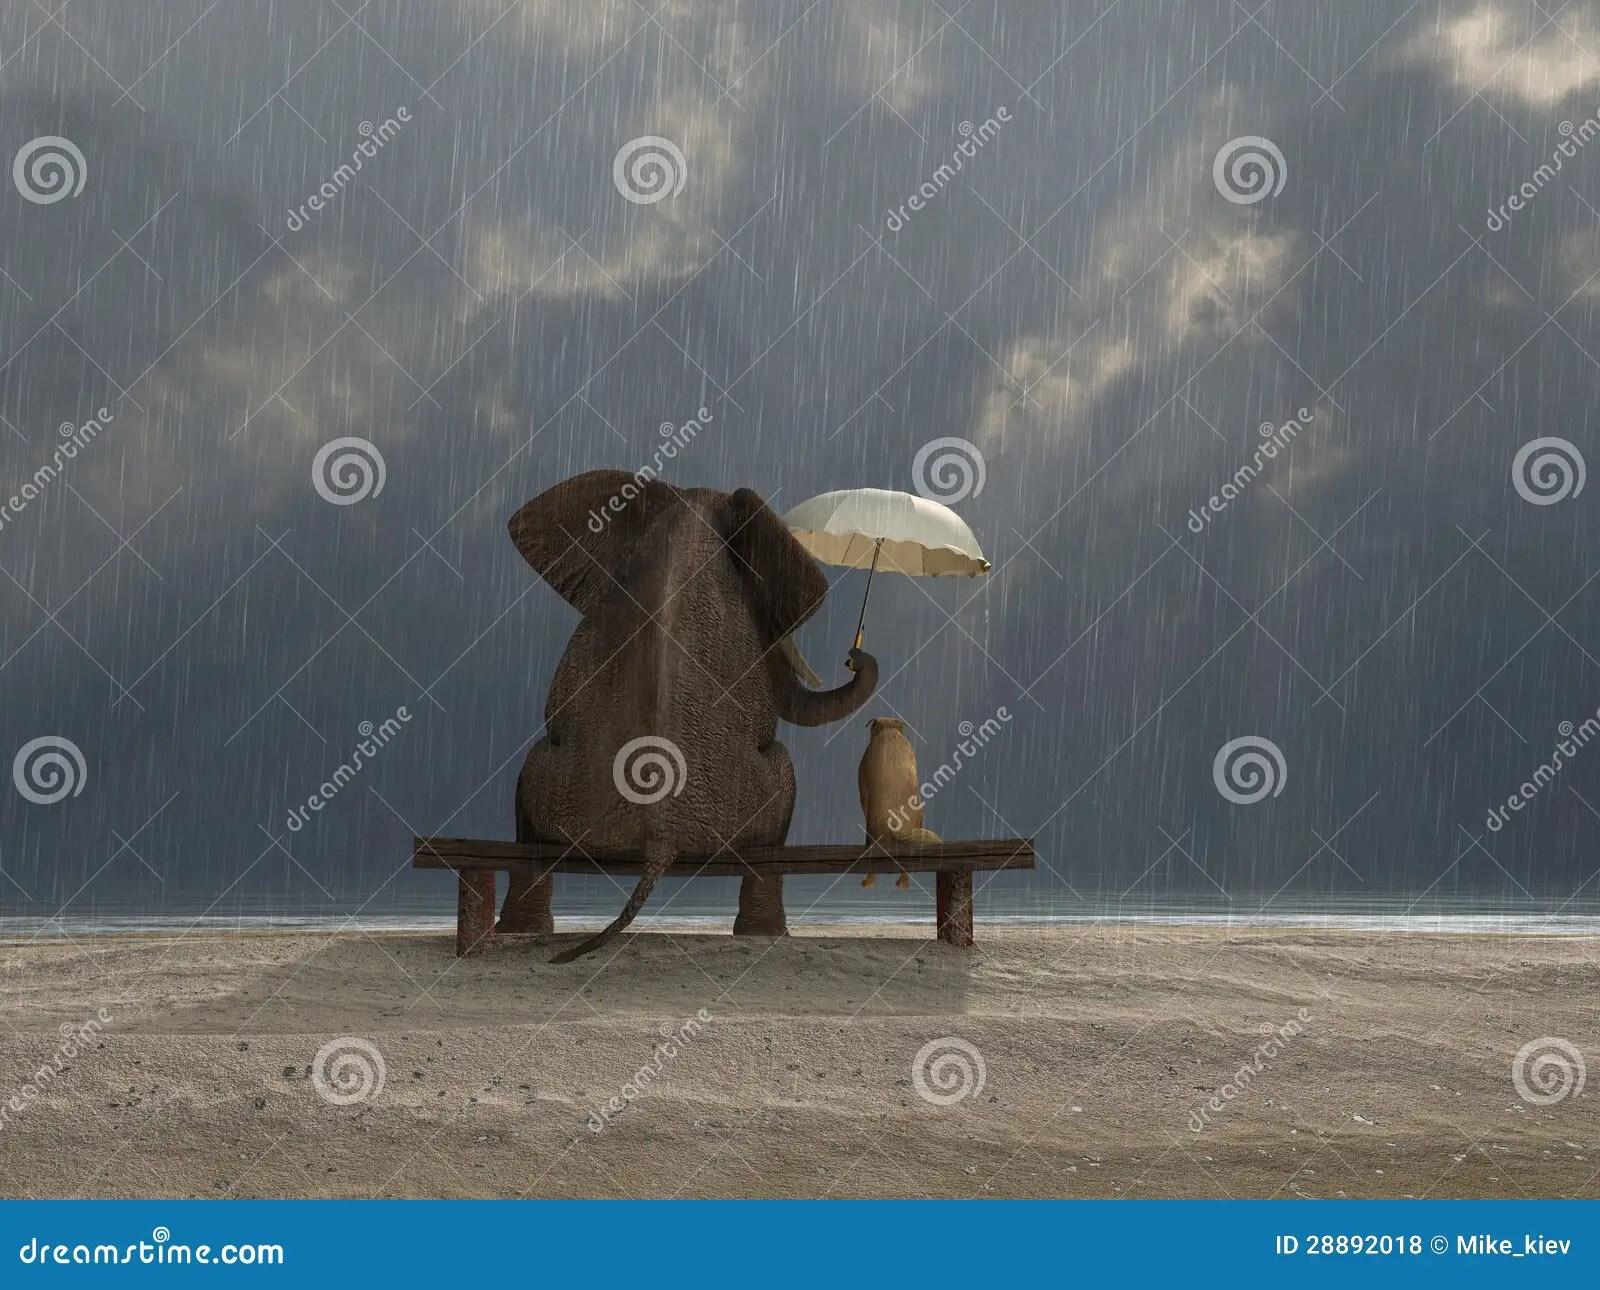 Elephant And Dog Sit Under The Rain Royalty Free Stock